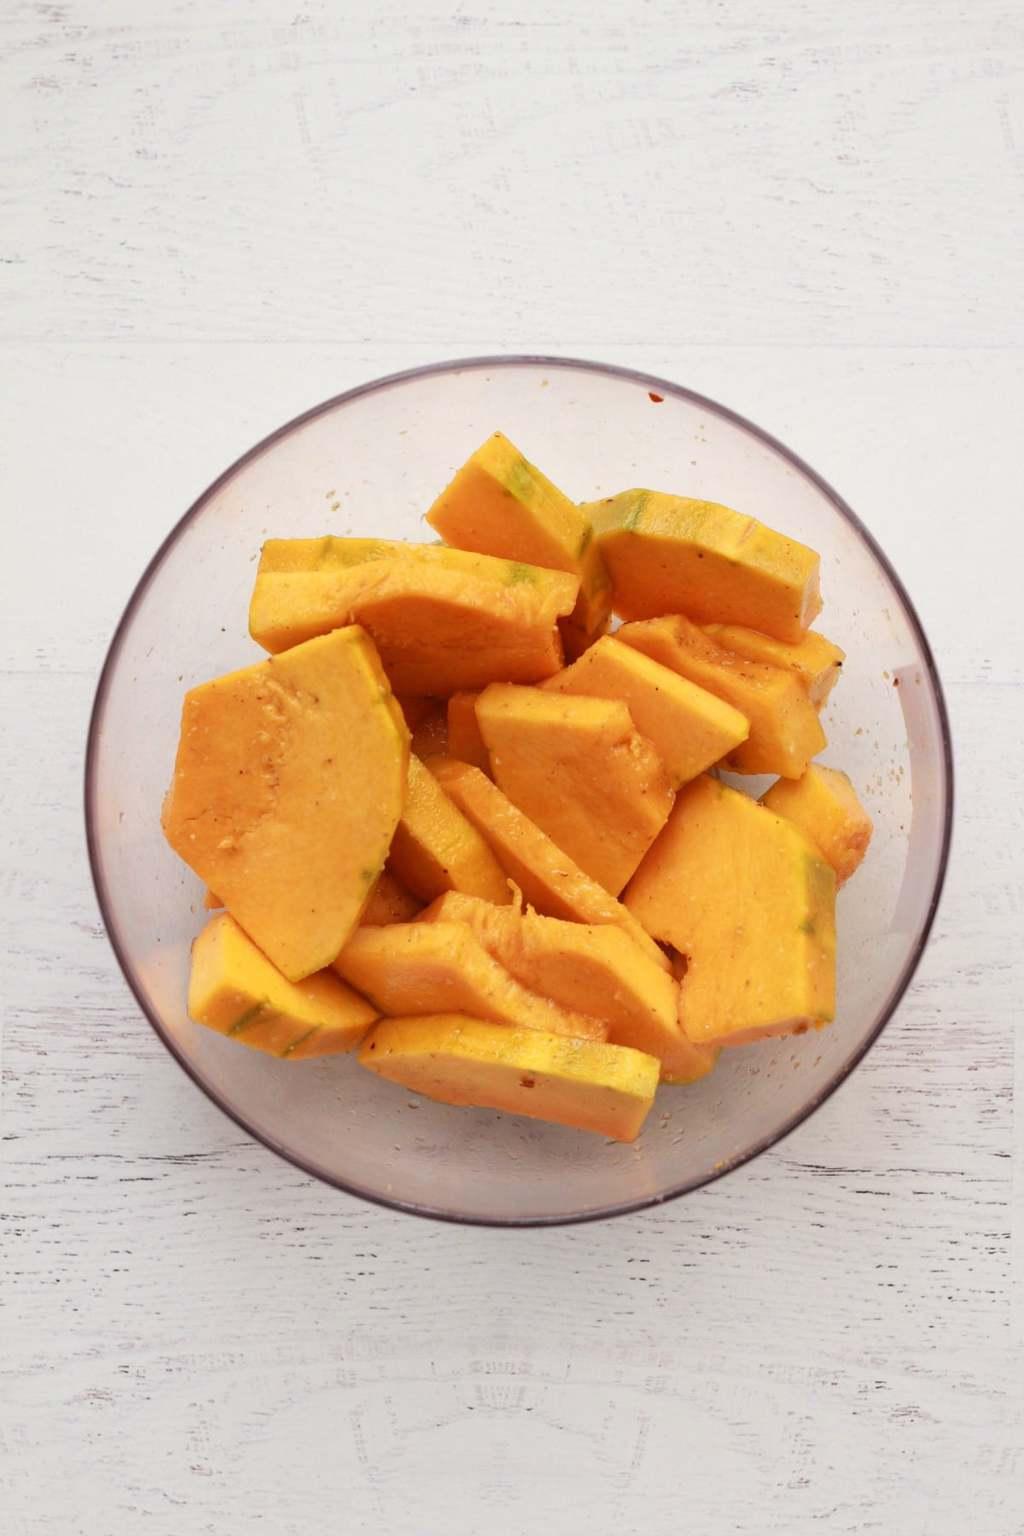 Making Pumpkin Hummus #vegan #lovingitvegan #glutenfree #pumpkin #hummus #appetizer #side #dip